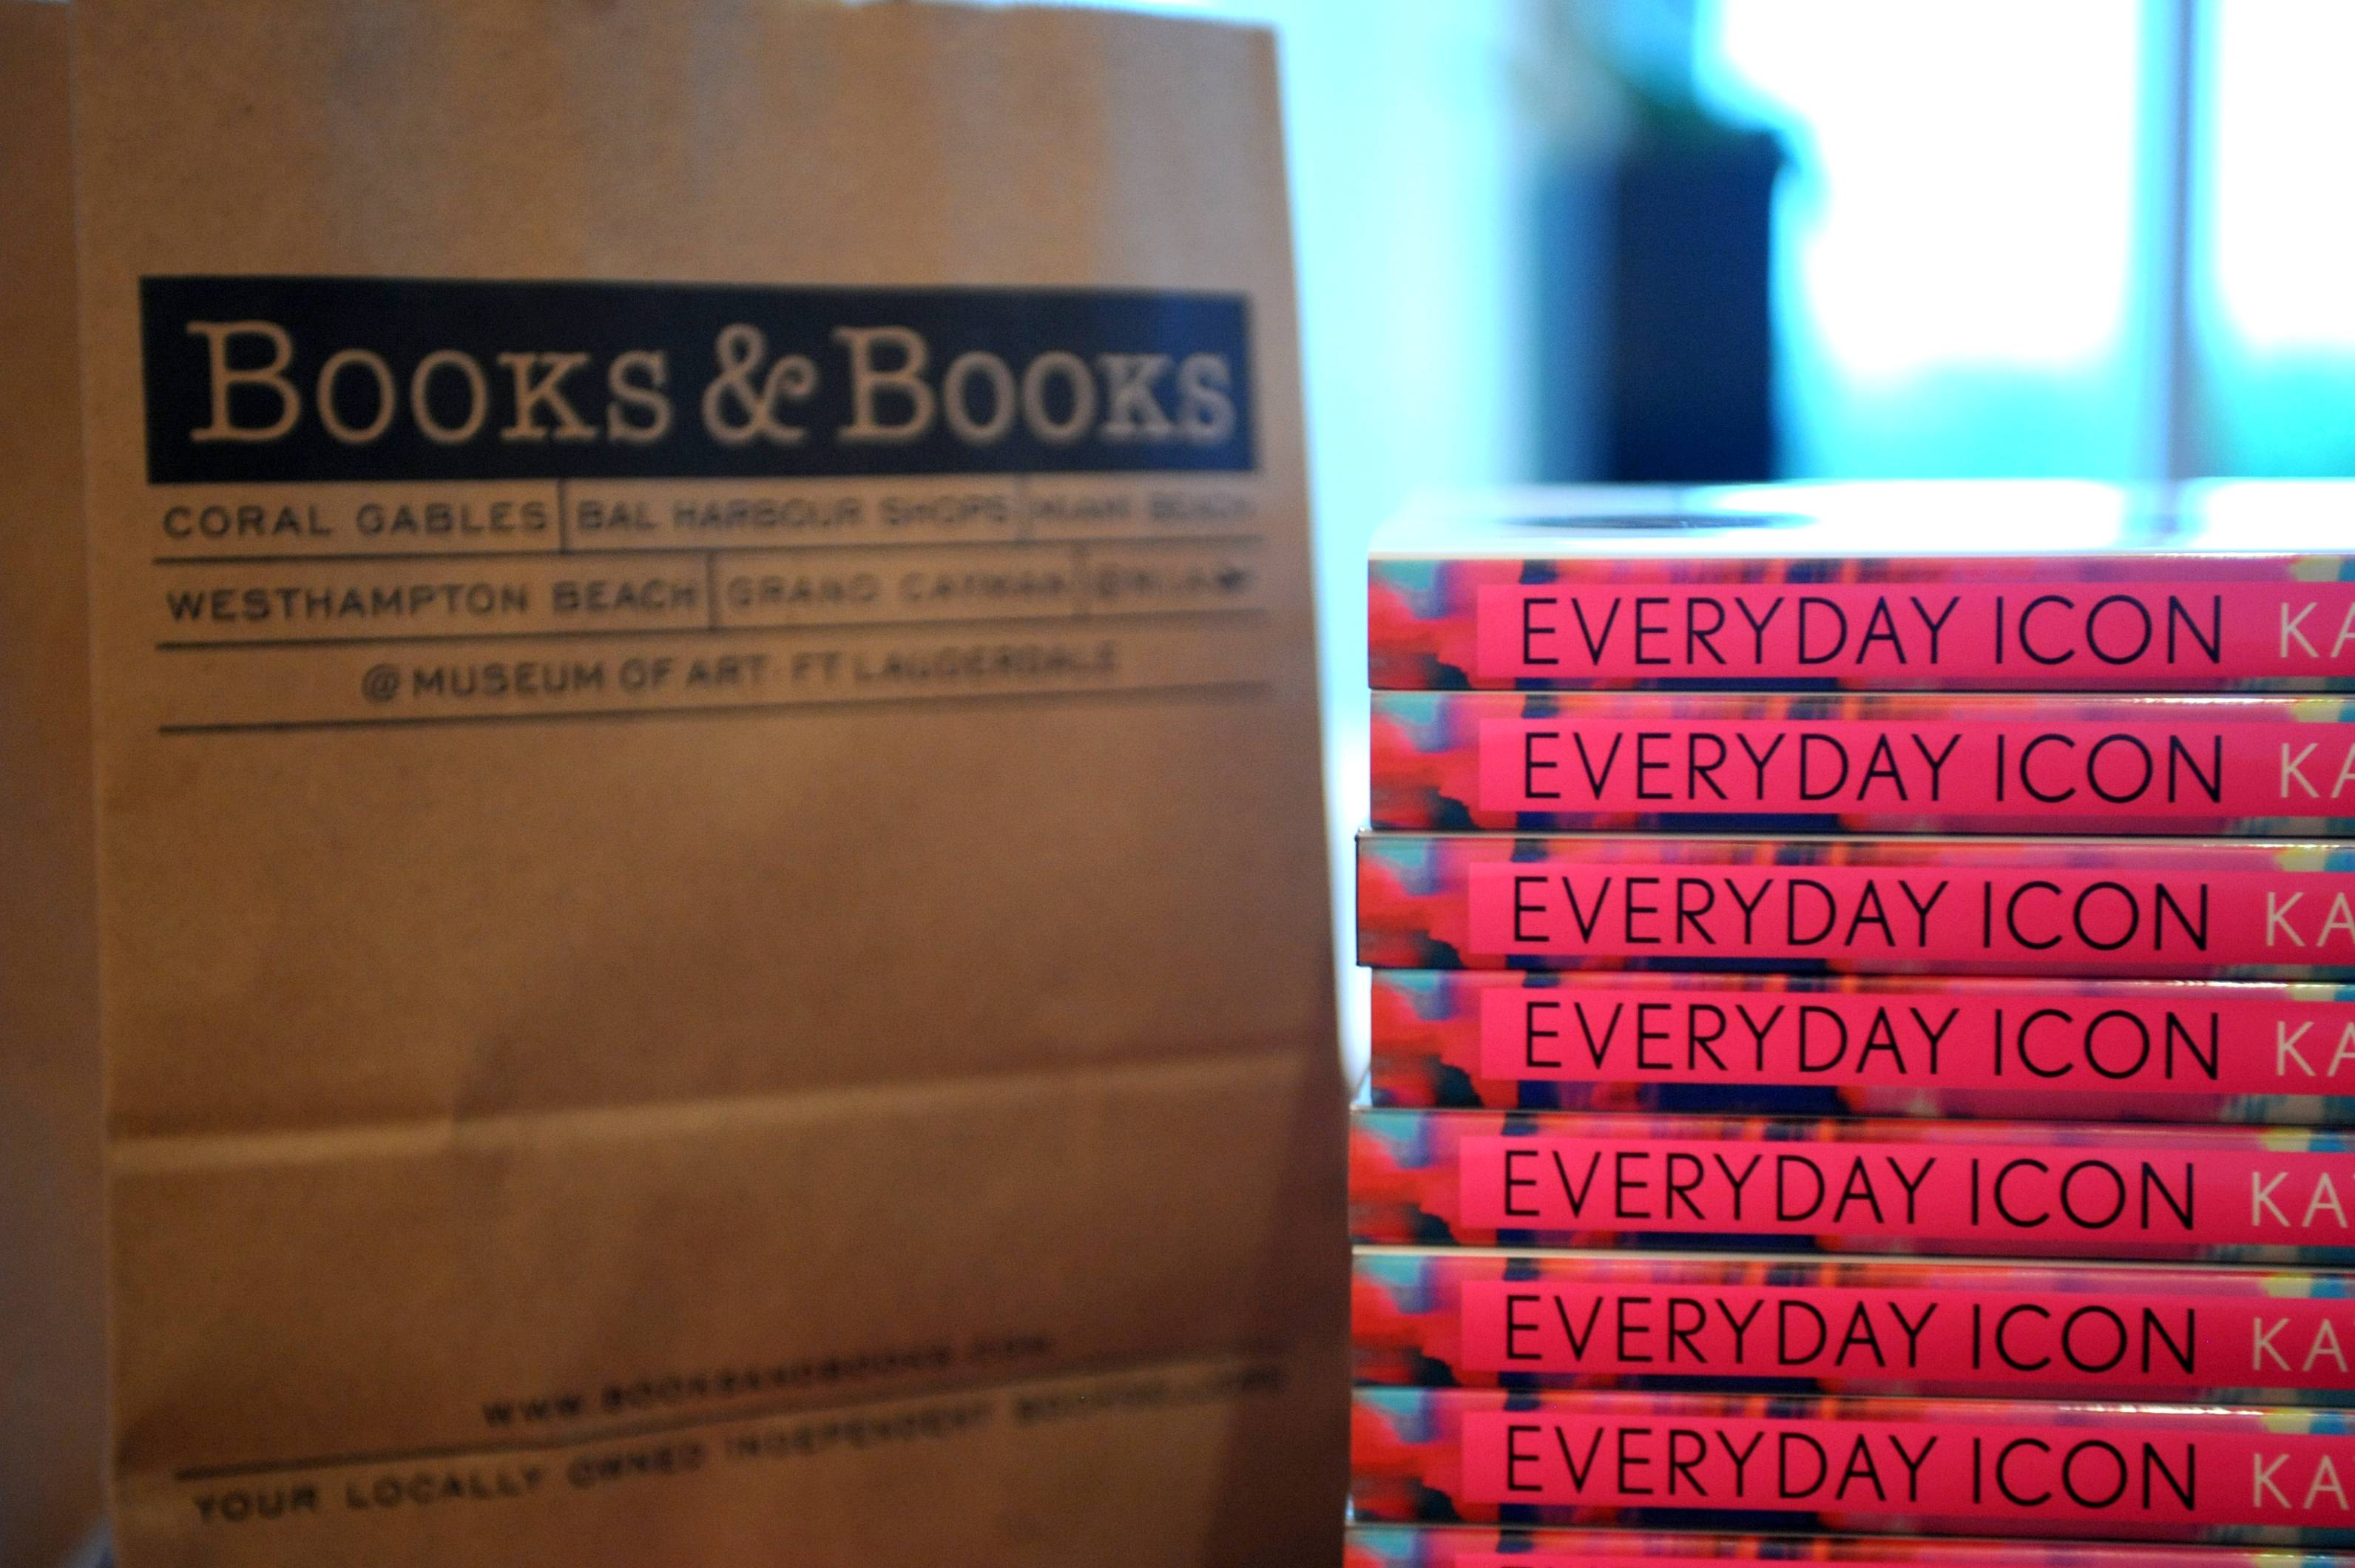 Books & Books Stand